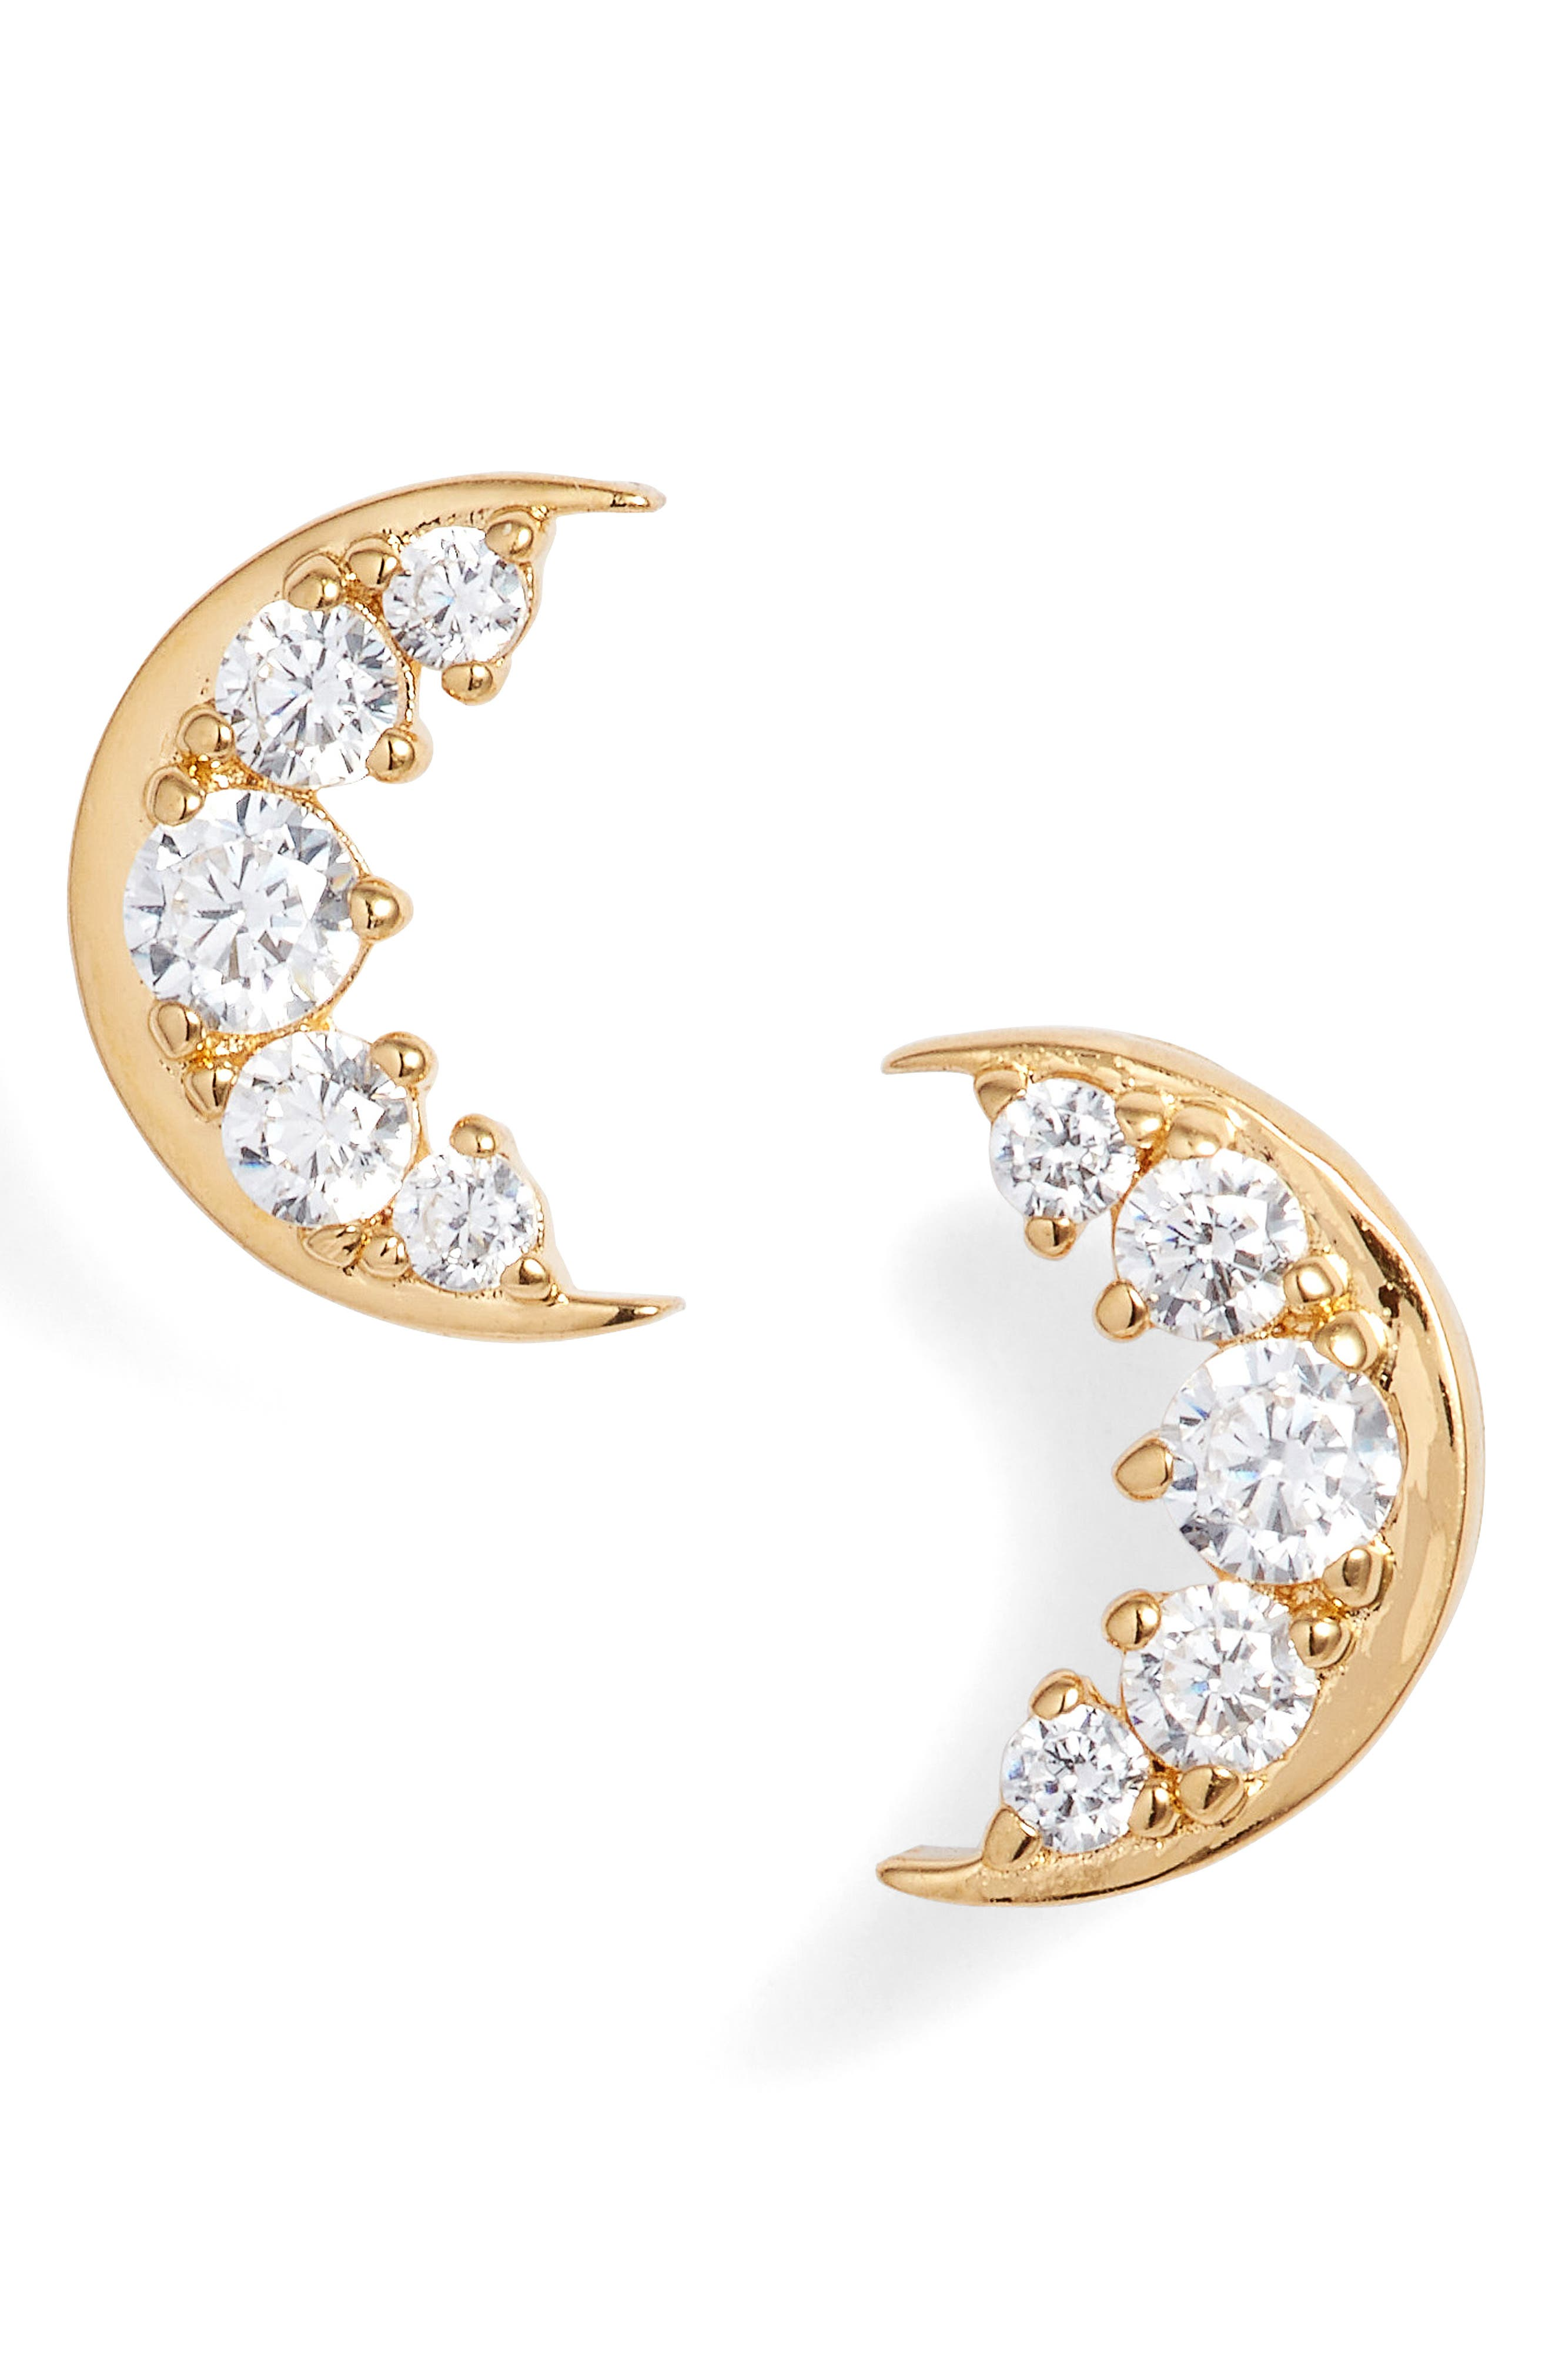 Nadri Reminisce Cubic Zirconia Moon Stud Earrings